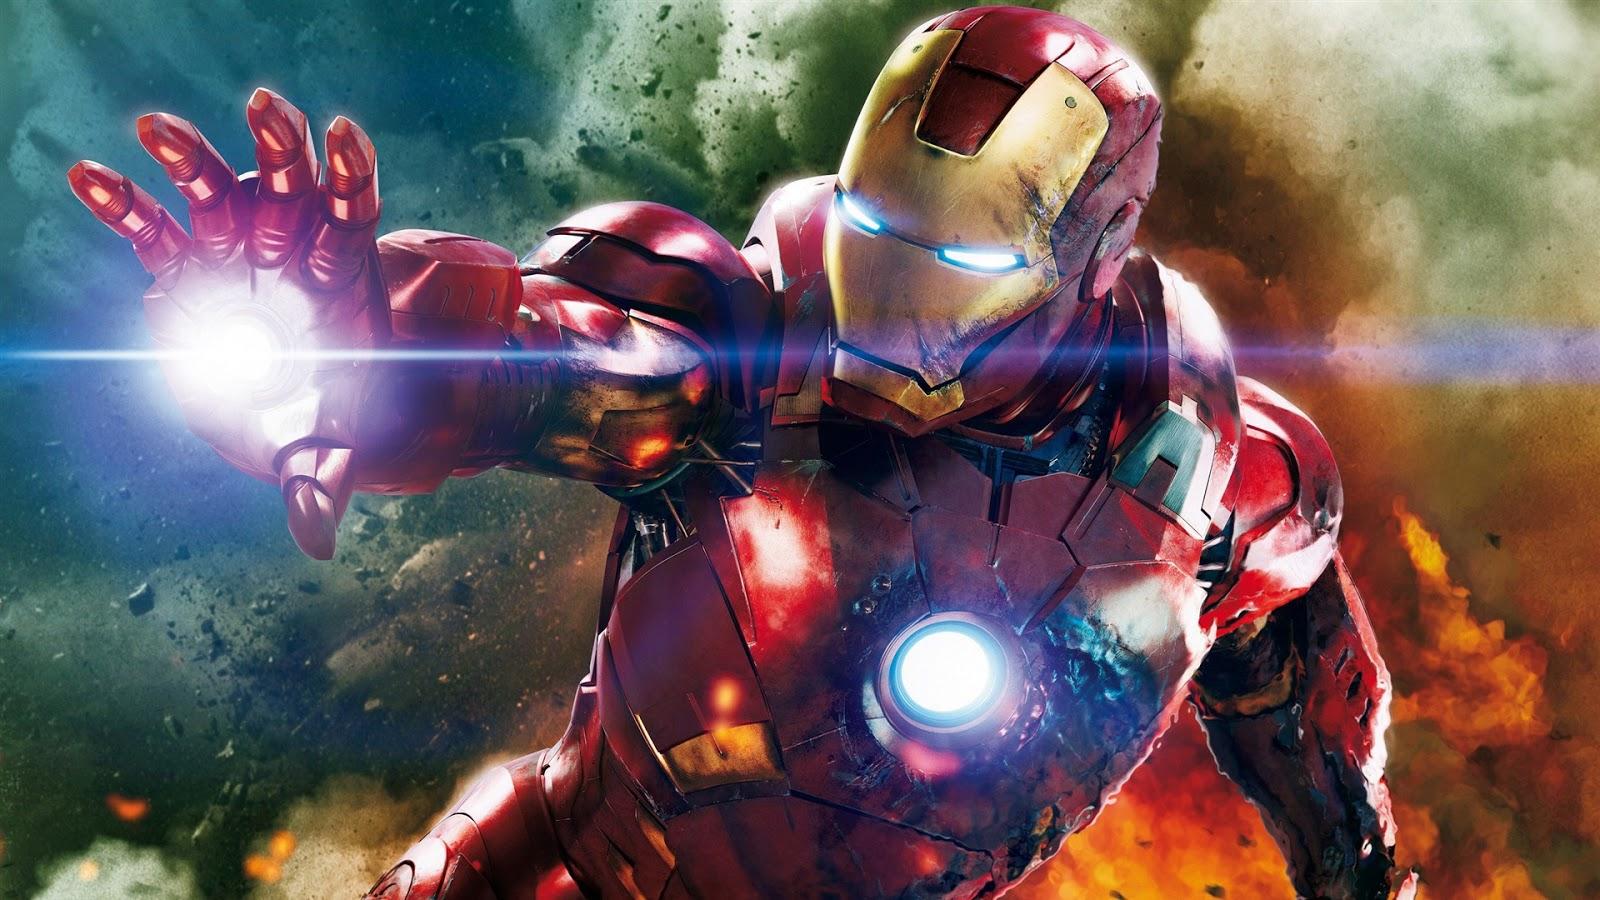 Iron Man 3 Theme For Windows 7 And 8 Eteknix 1600x900